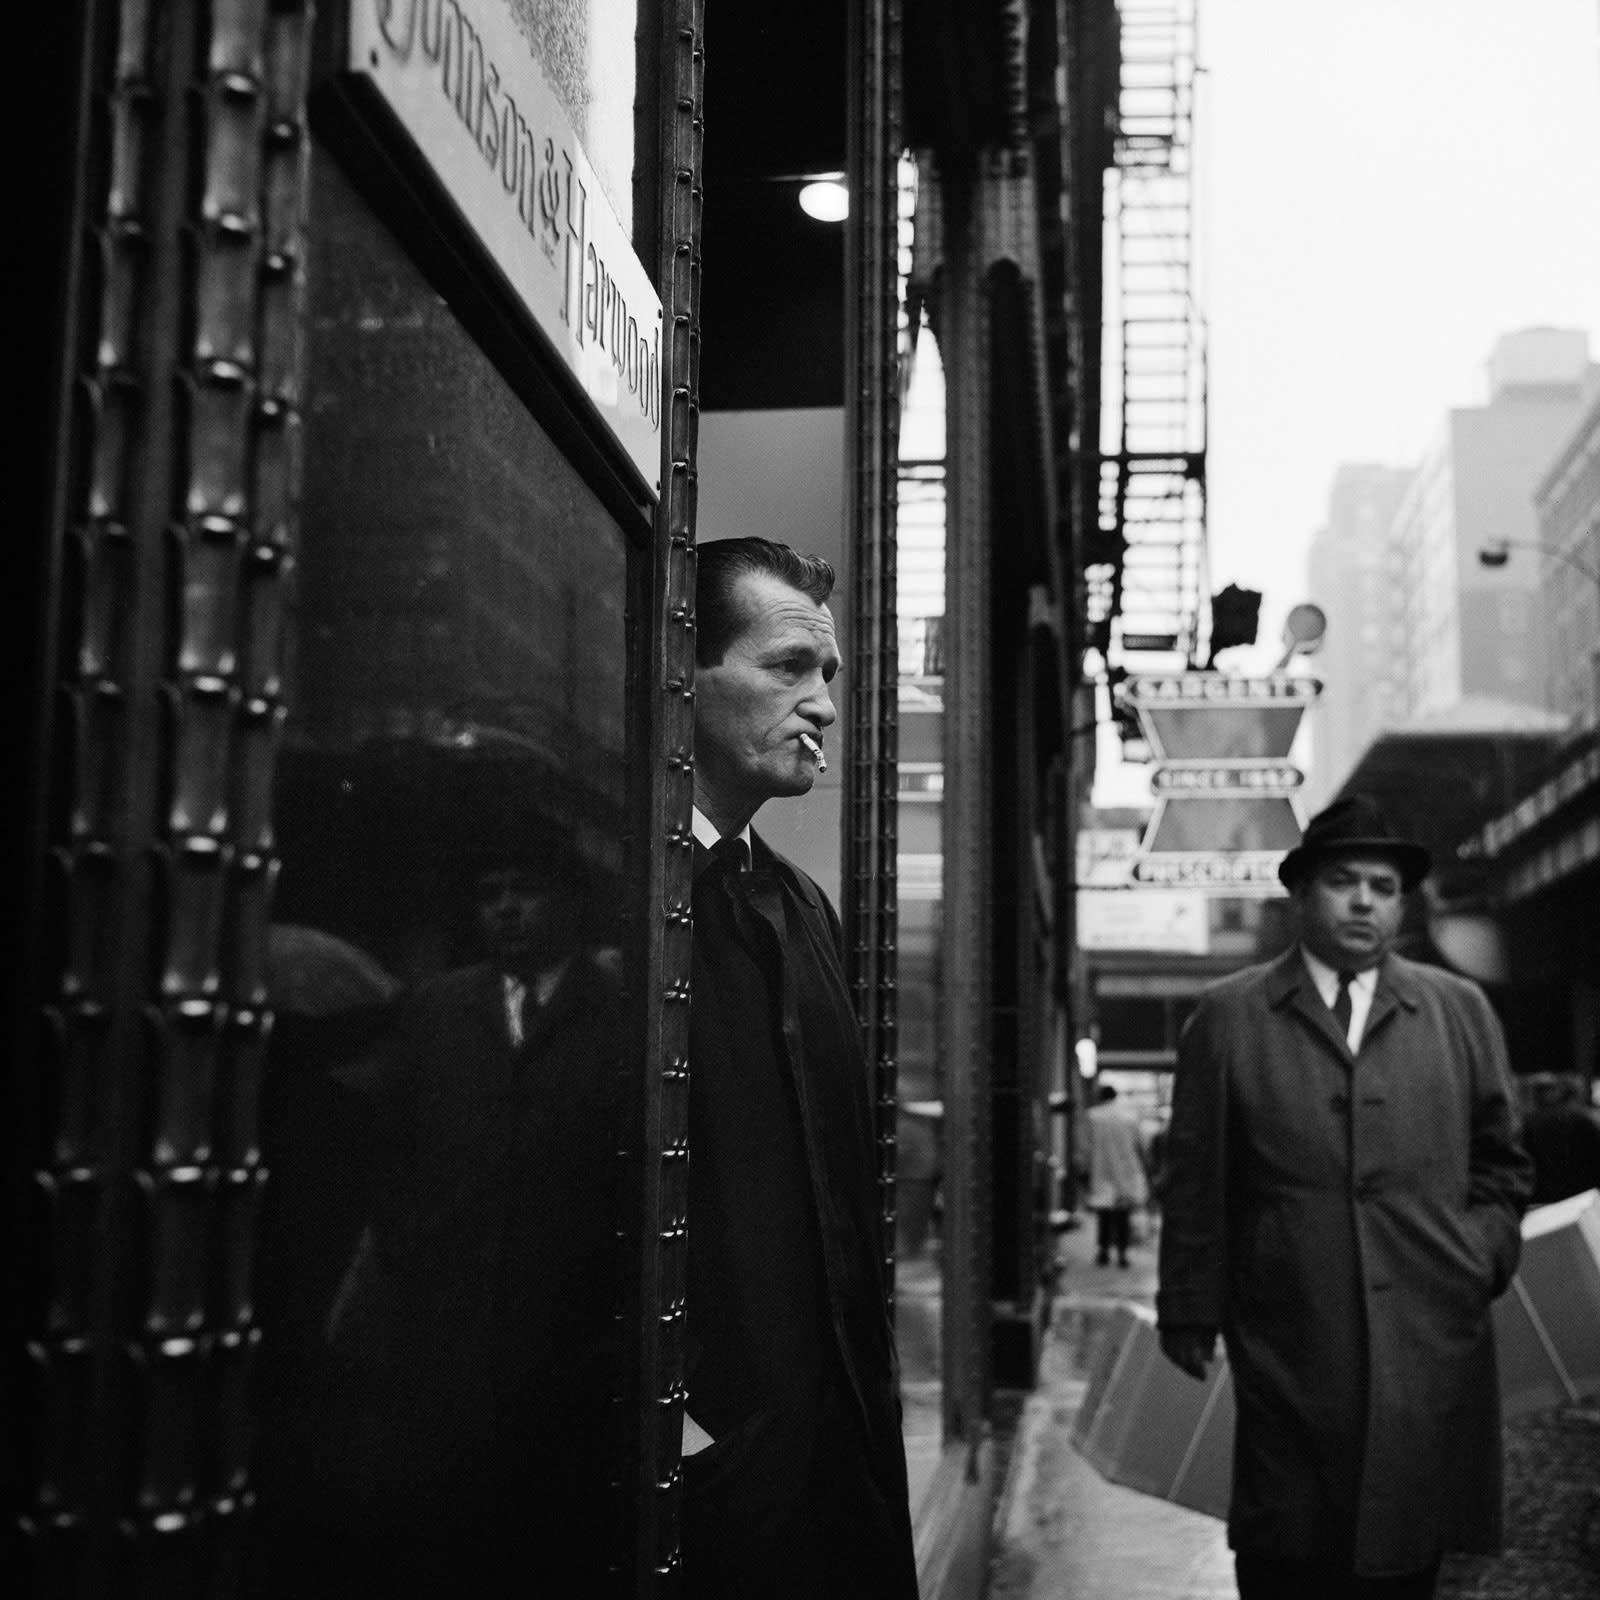 Vivian Maier, Chicago, IL, March 31, 1966